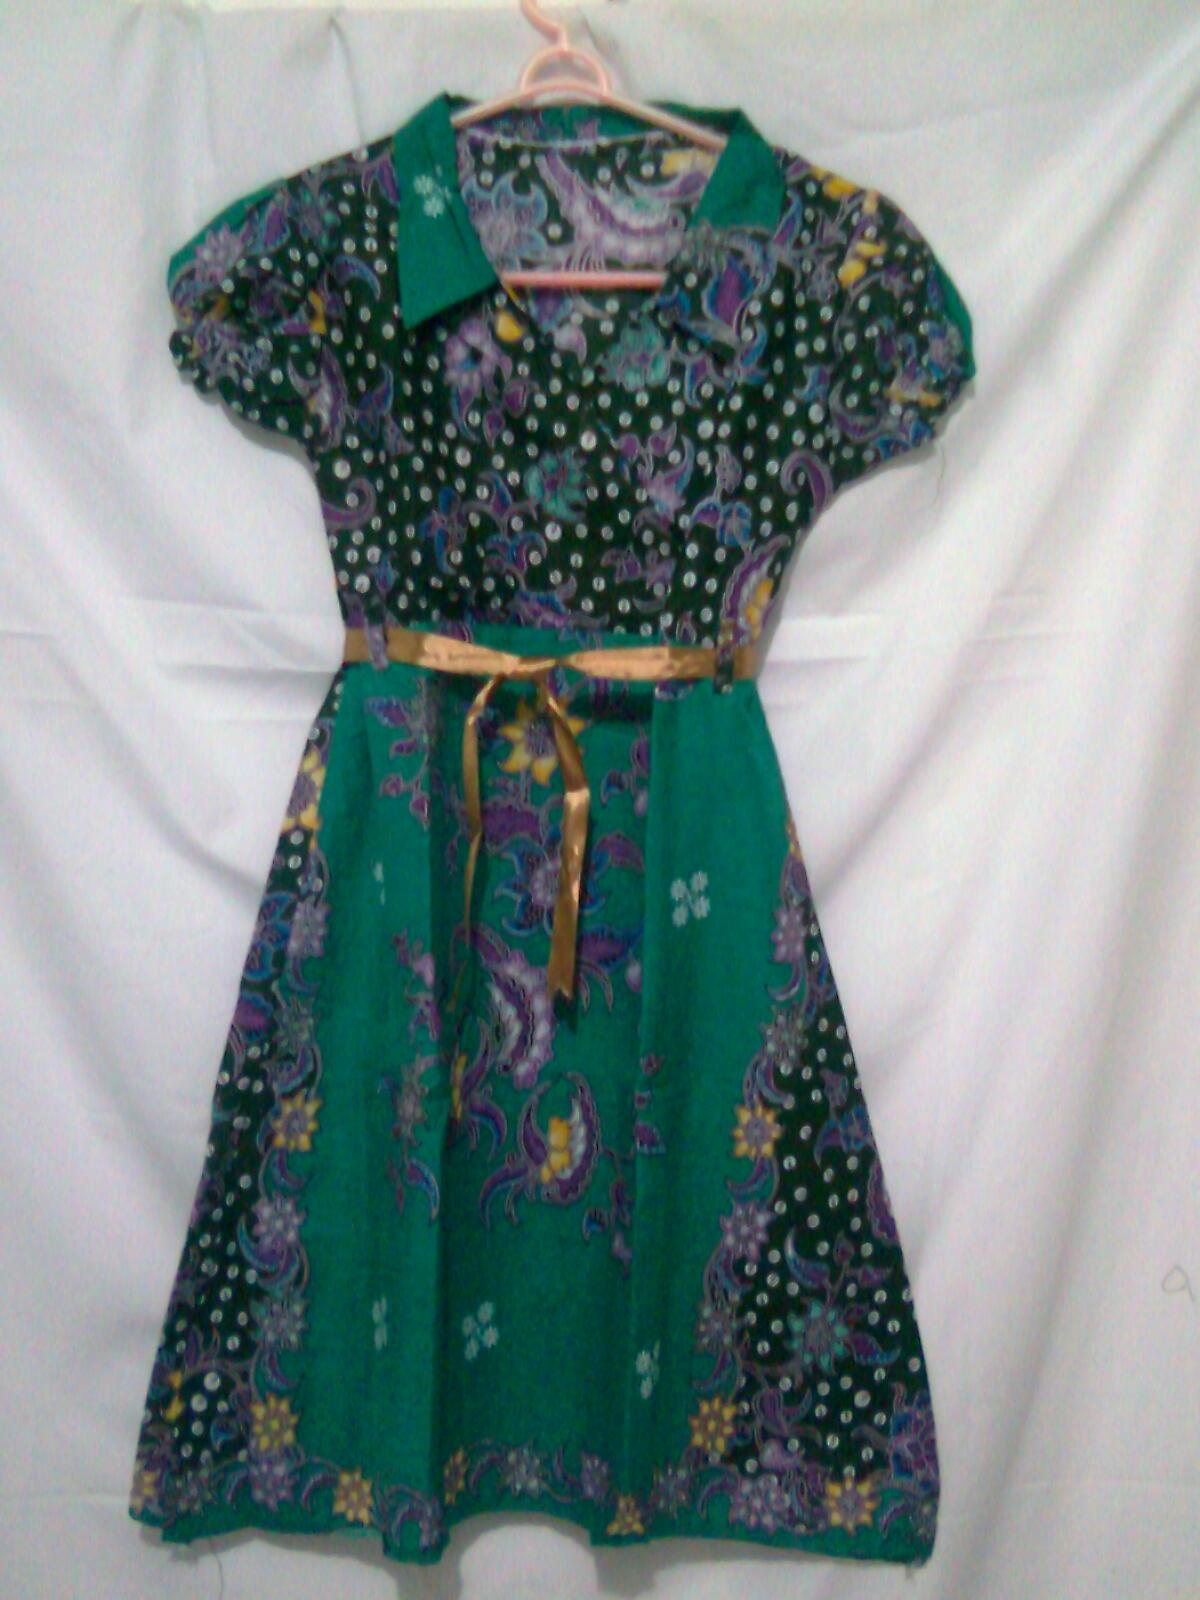 Model Baju Batik Anak Perempuan Umur 8 Tahun - Batik Loka Jaya